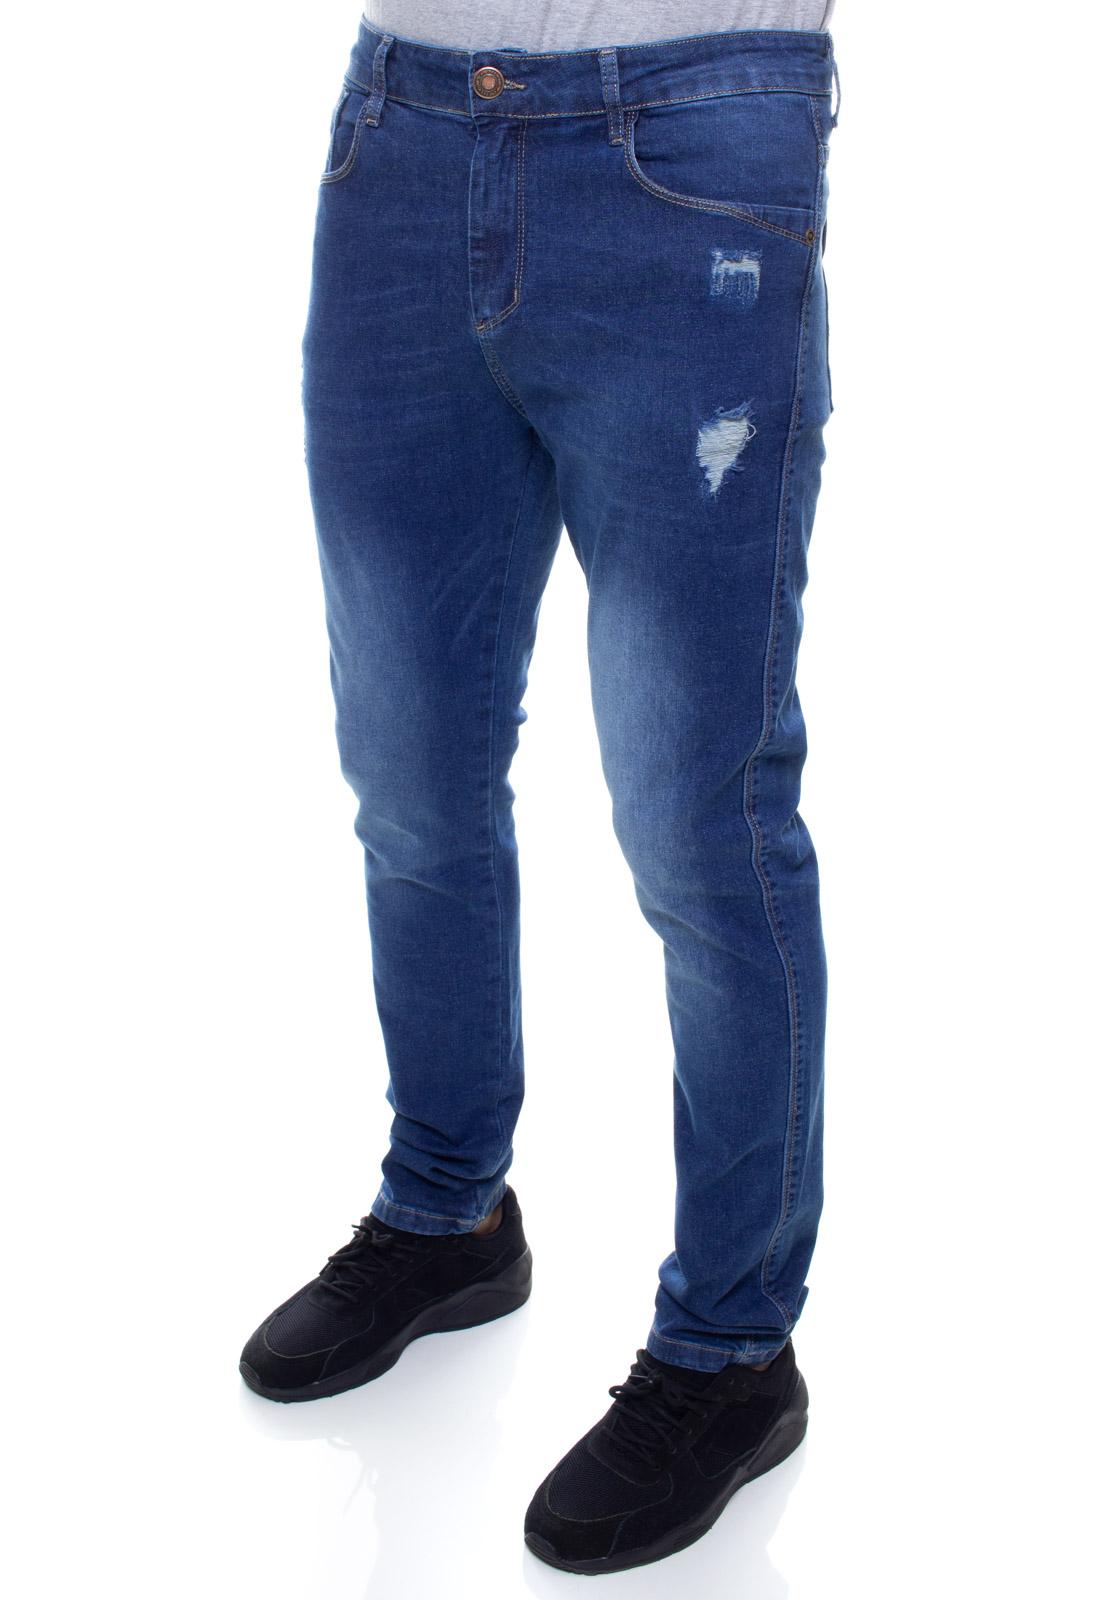 Calça Confort Jeans Masculina Crocker - 48067  - CROCKER JEANS